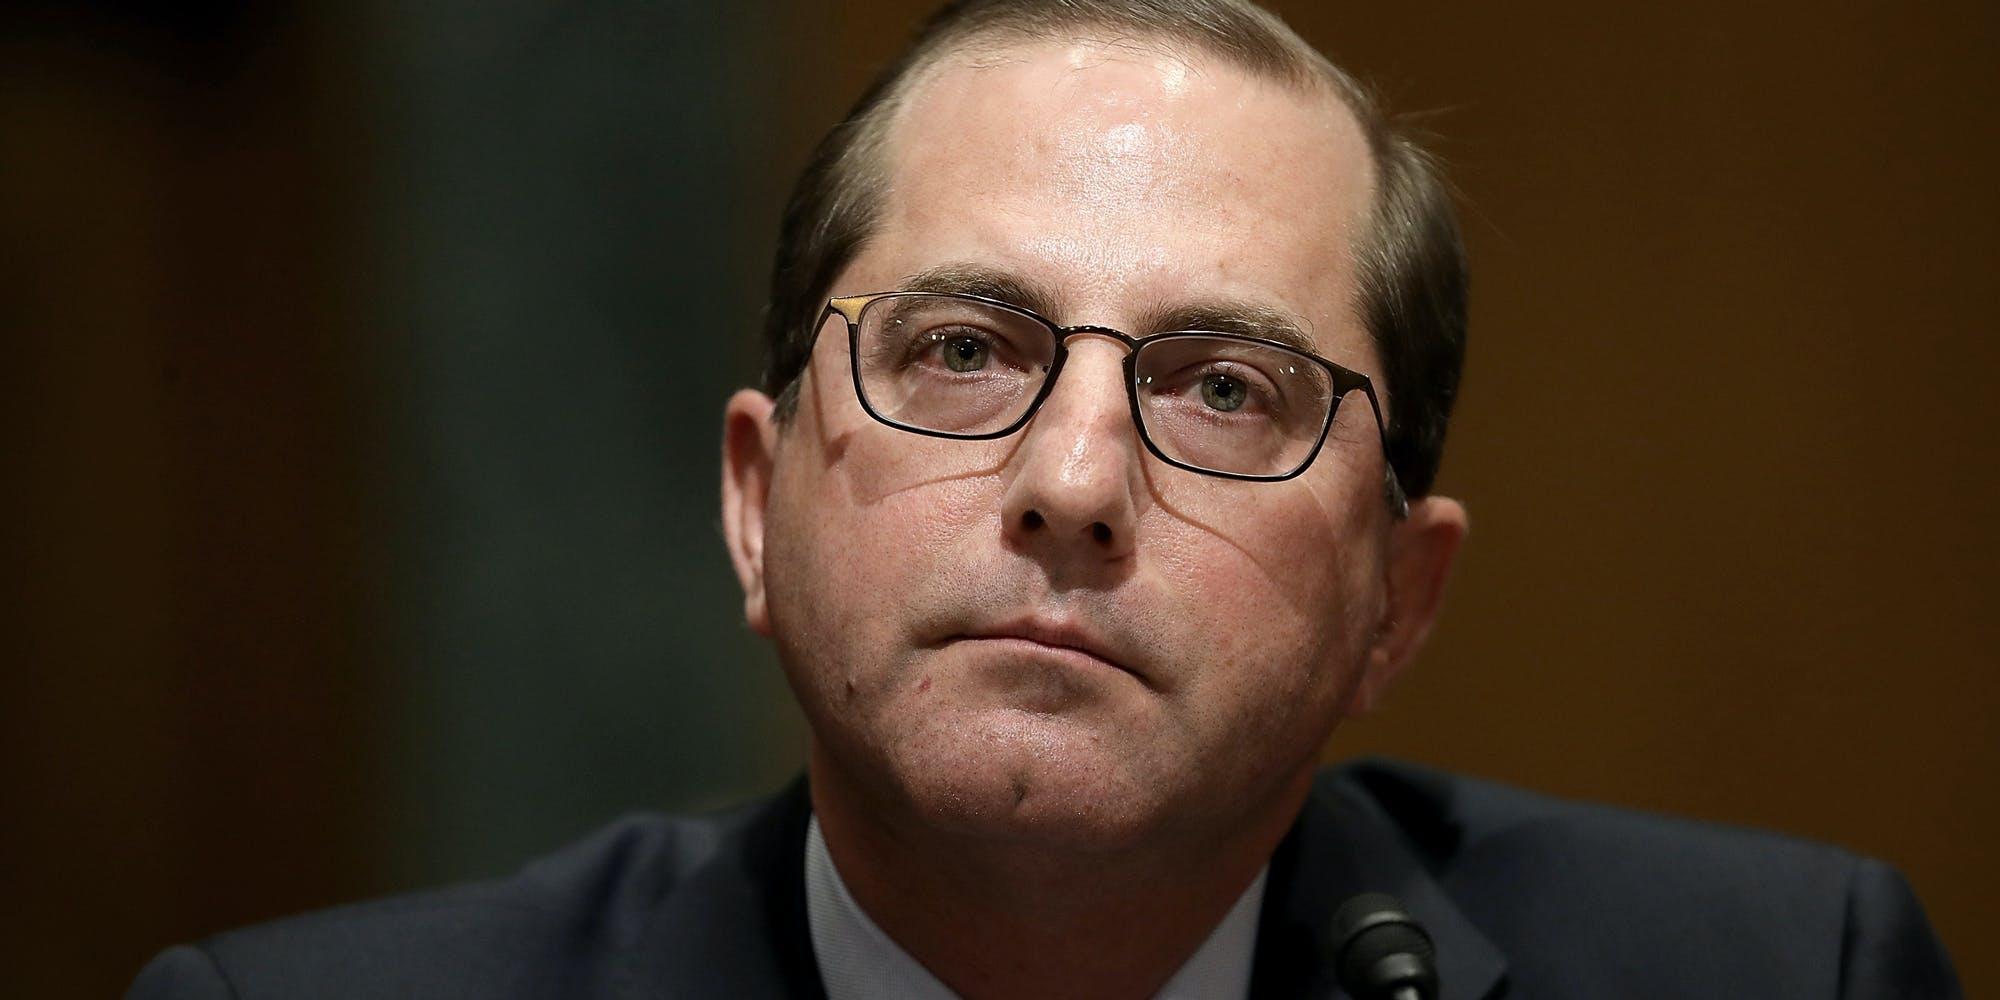 U.S. Health And Human Services Secretary Alex Azar Says Medical Marijuana Doesn't Exist